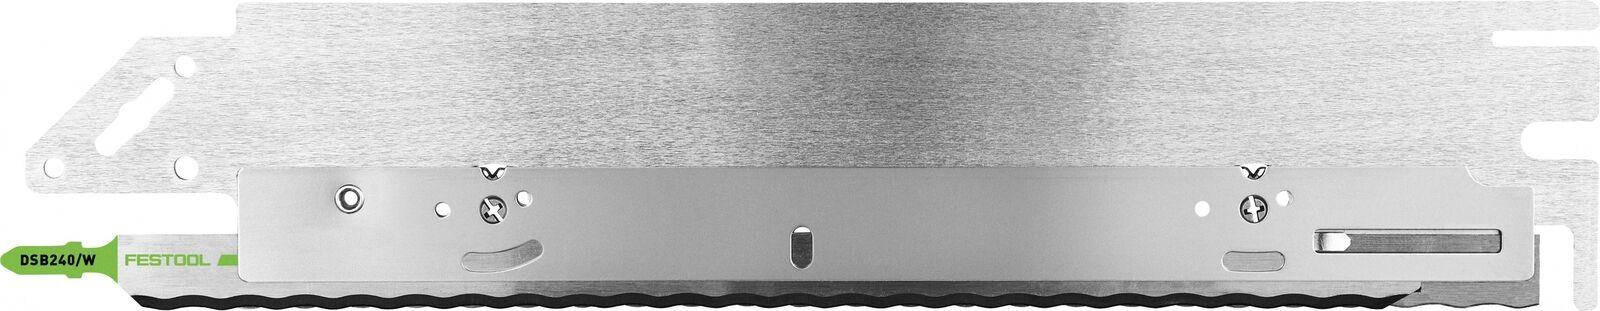 Festool Schneidgarnitur SG-240 W-ISC   575411